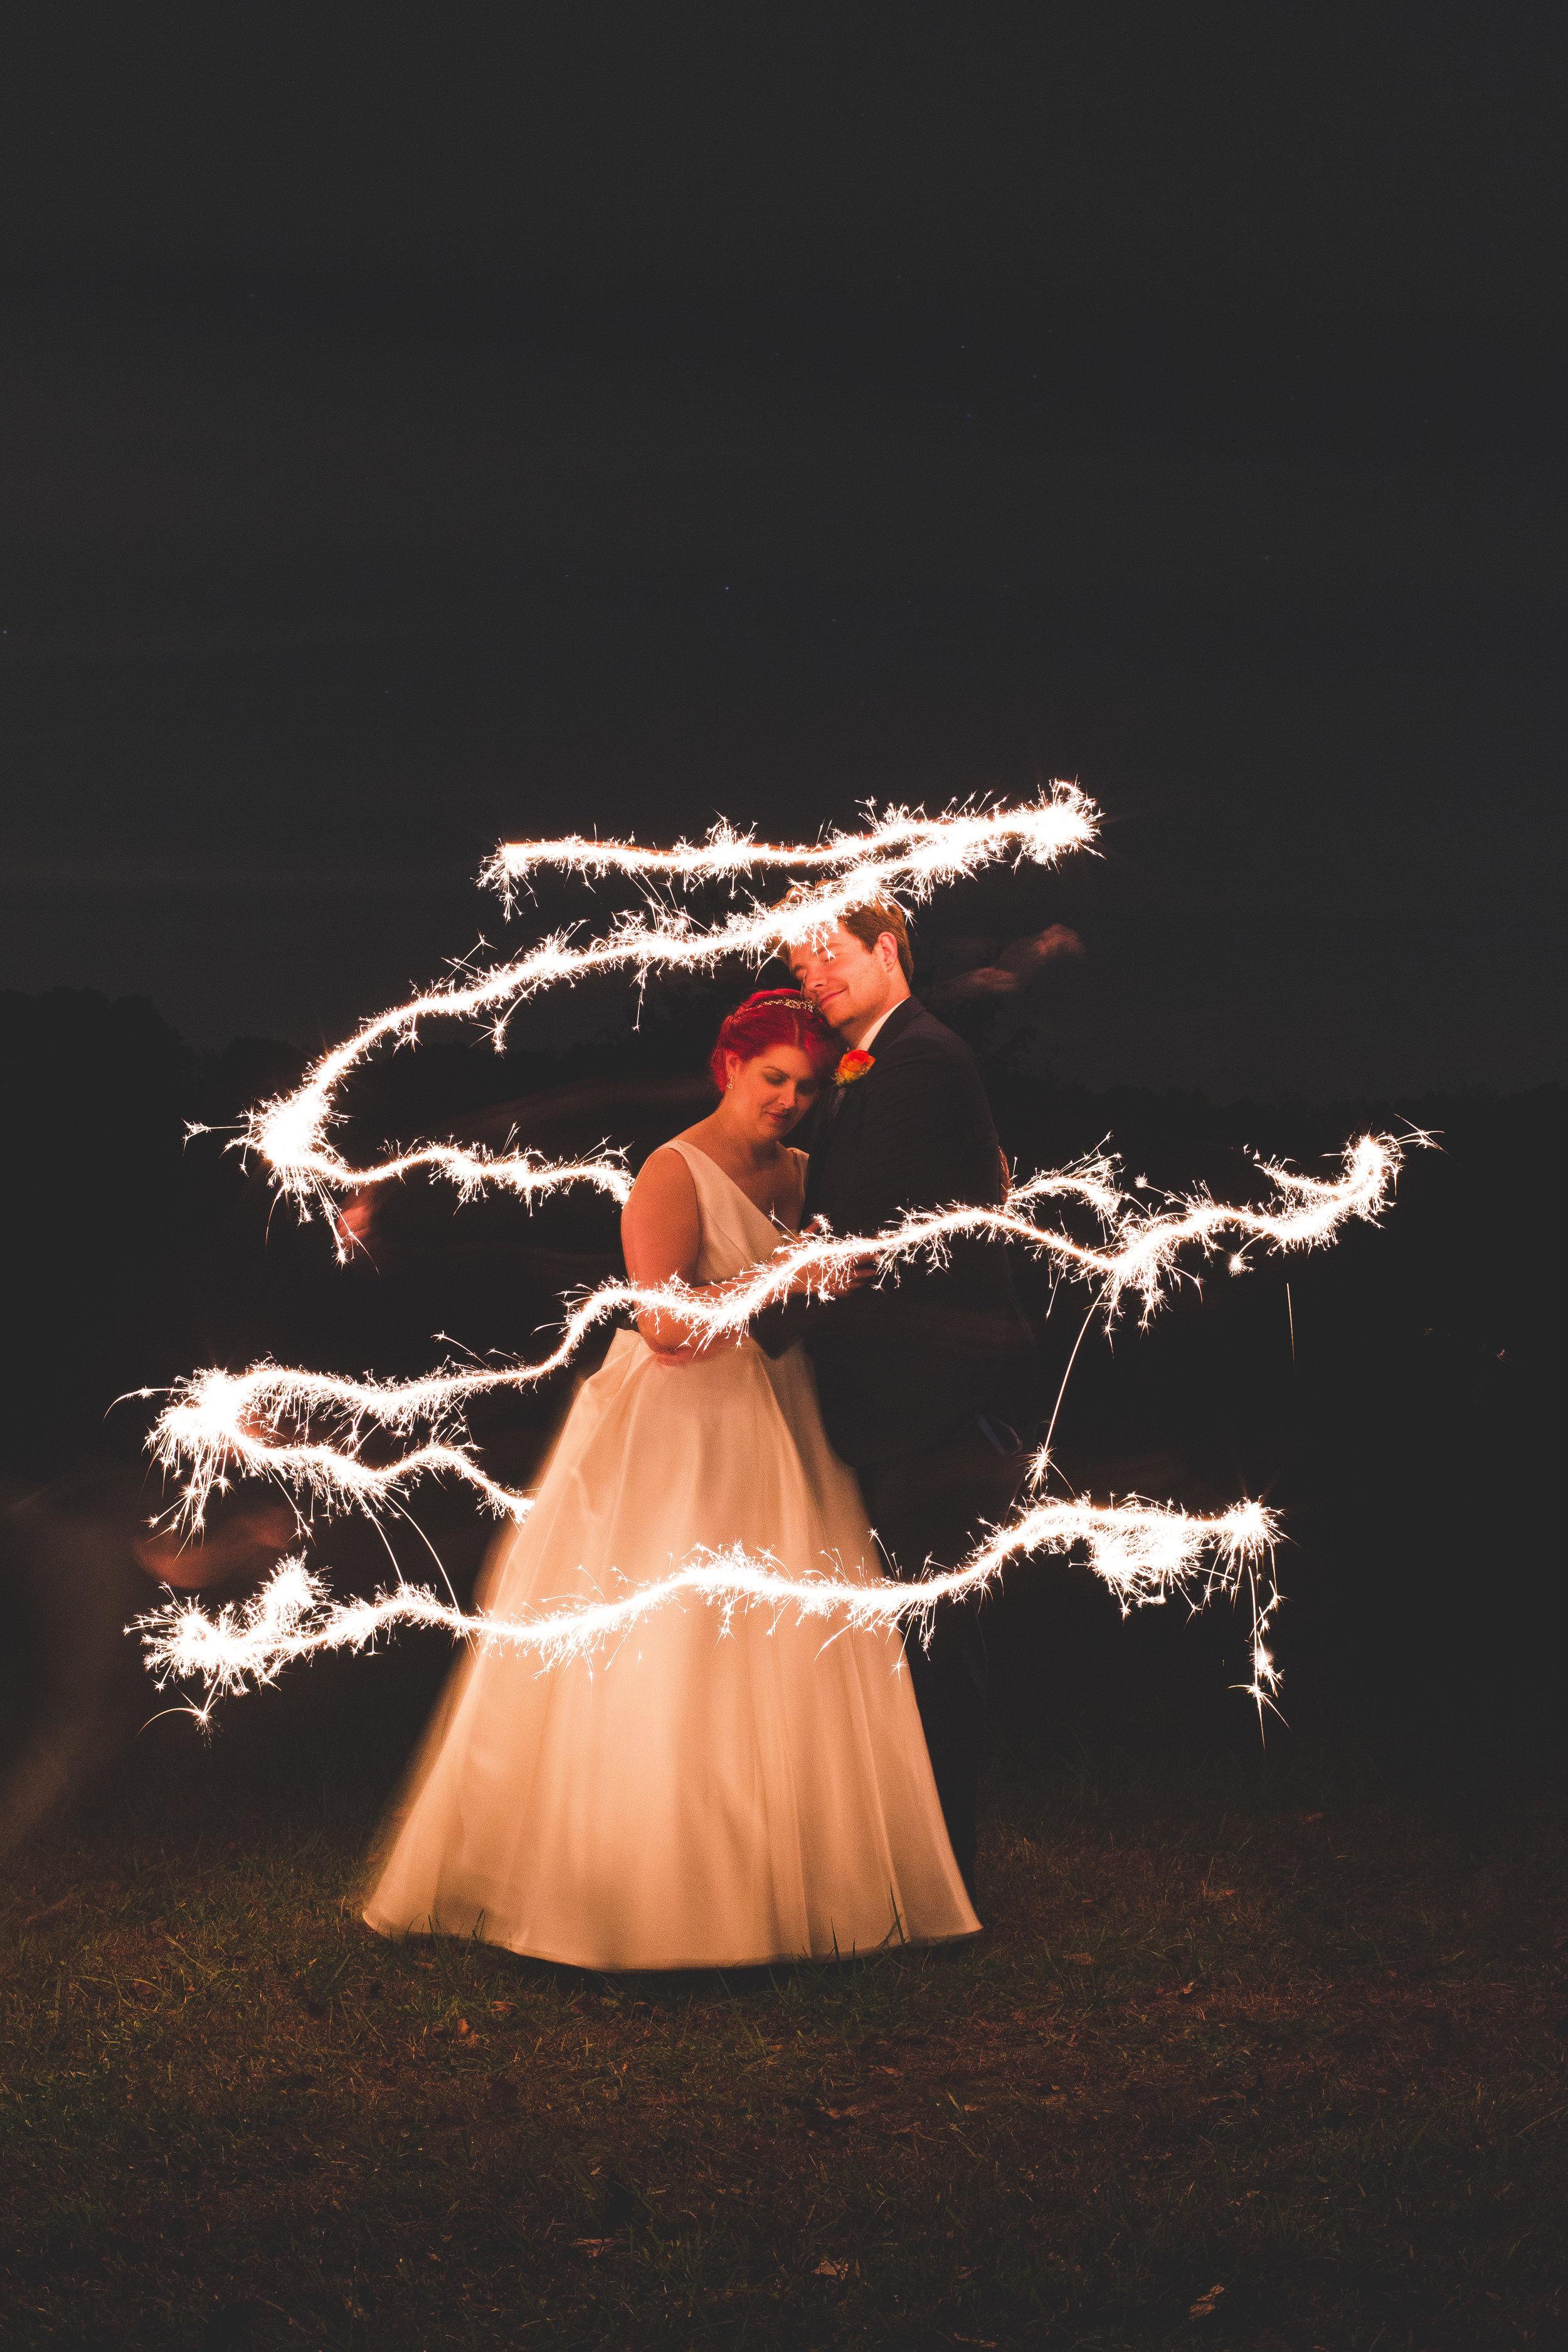 sparkler magical dreamy wedding photo